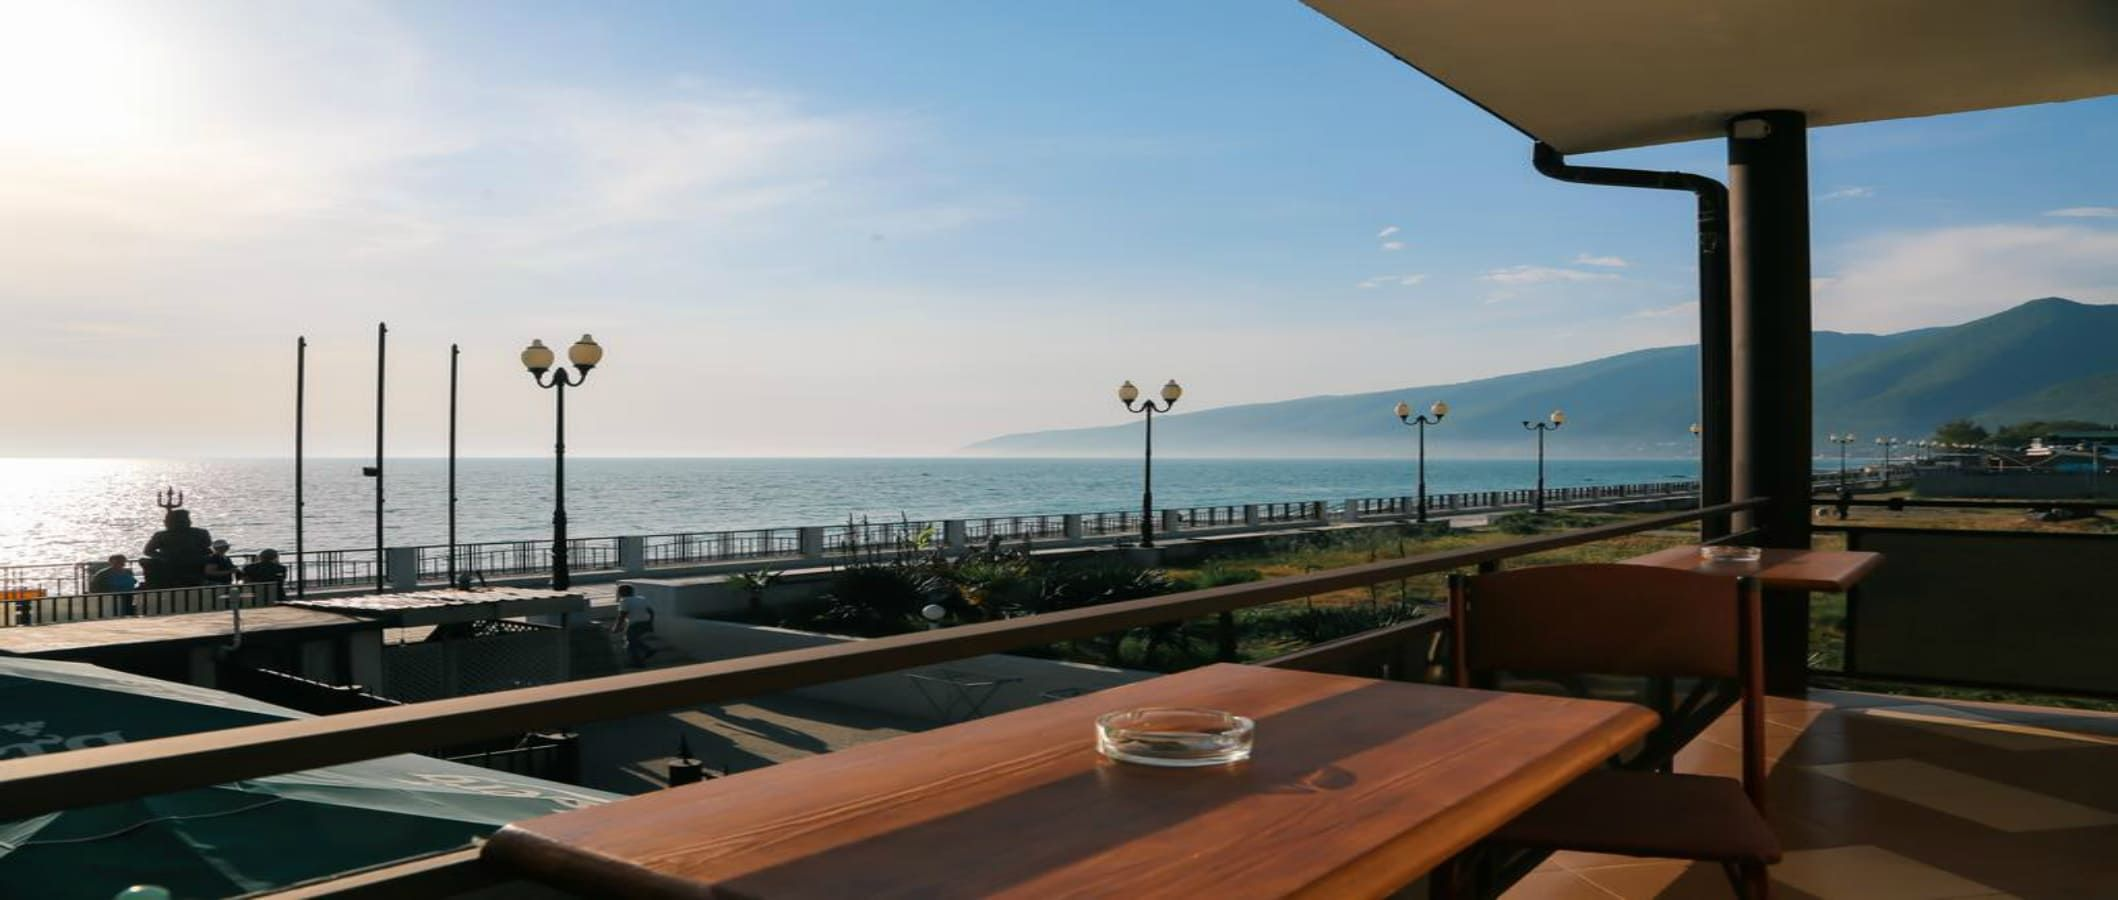 Отель Hotel-club Poseidon (Гагра|Абхазия)